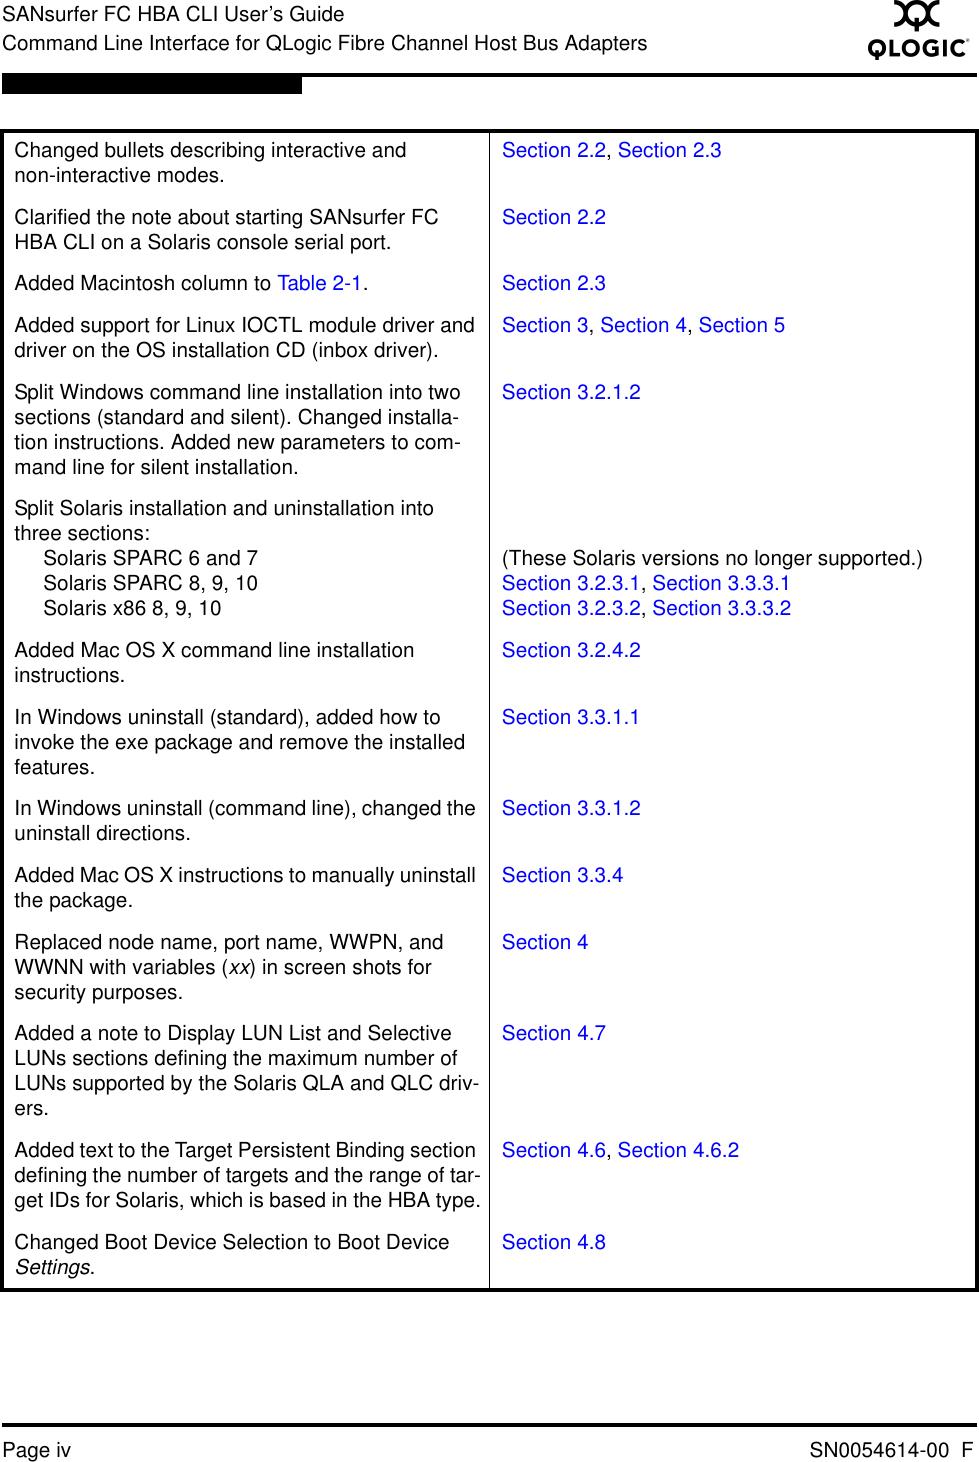 Q Logic Fc Hba Cli Users Manual SANsurfer User's Guide